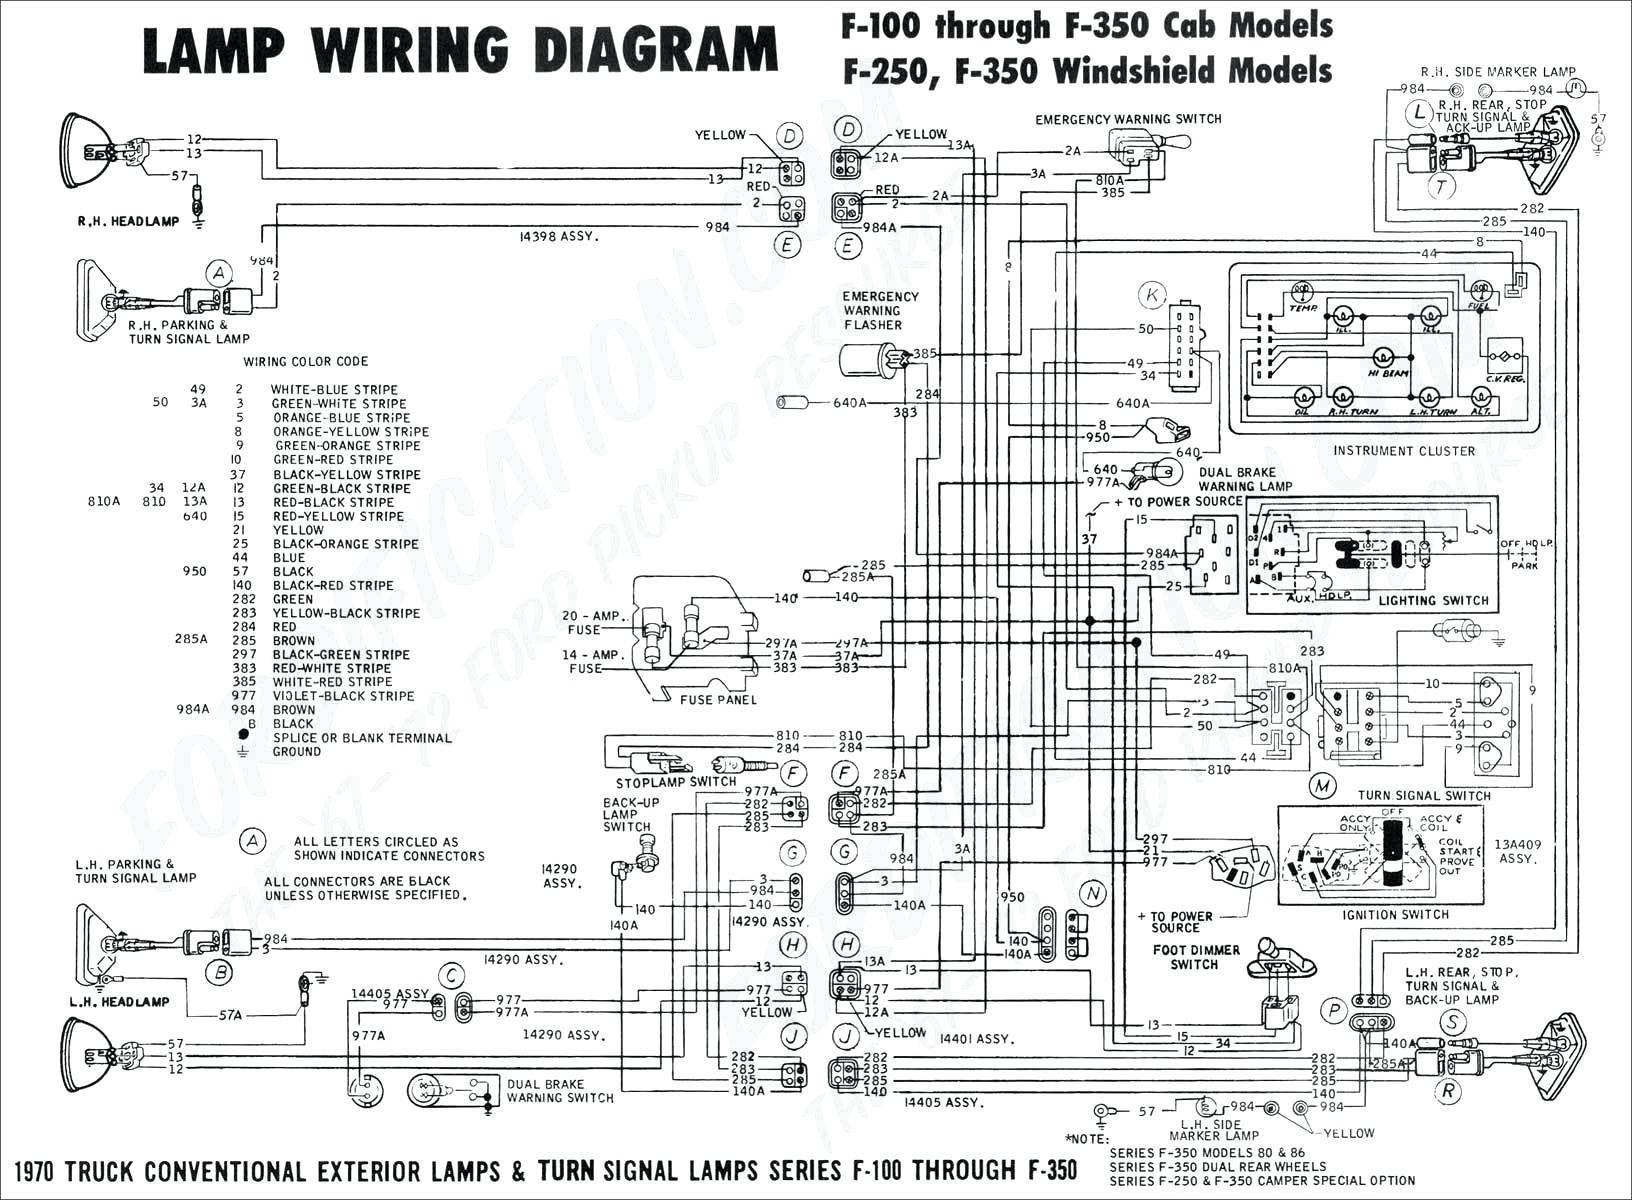 Blazer Tail Lights Wiring toyota Rear Stop Light Wiring Diagram Of Blazer Tail Lights Wiring